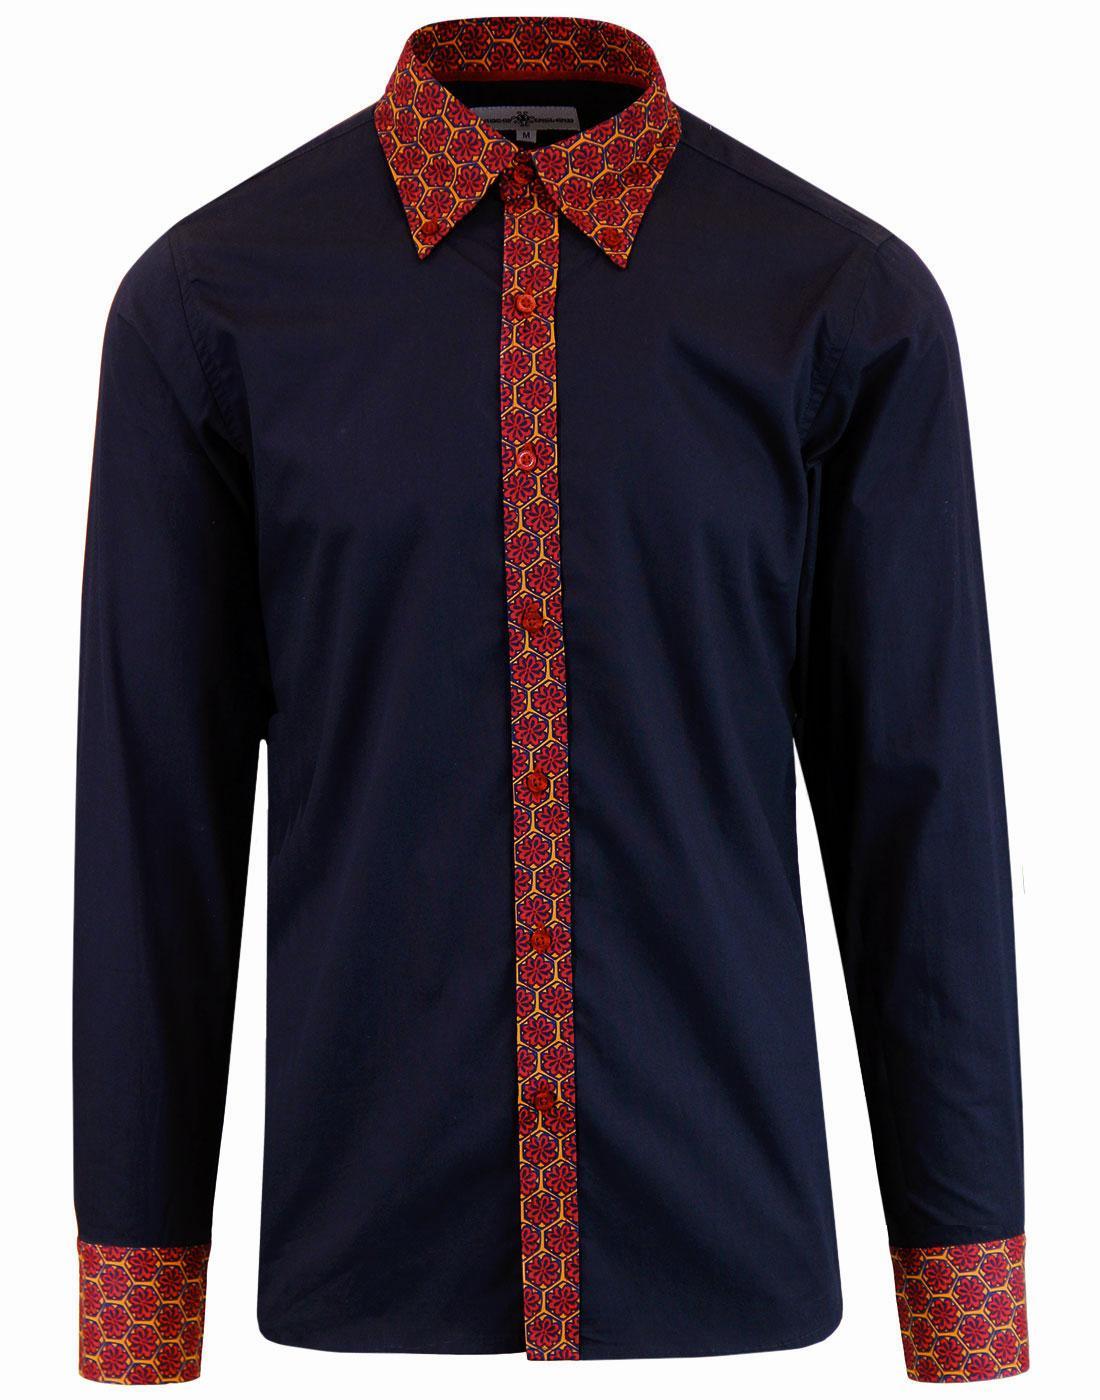 Costello MADCAP ENGLAND 60s Mod Floral Trim Shirt